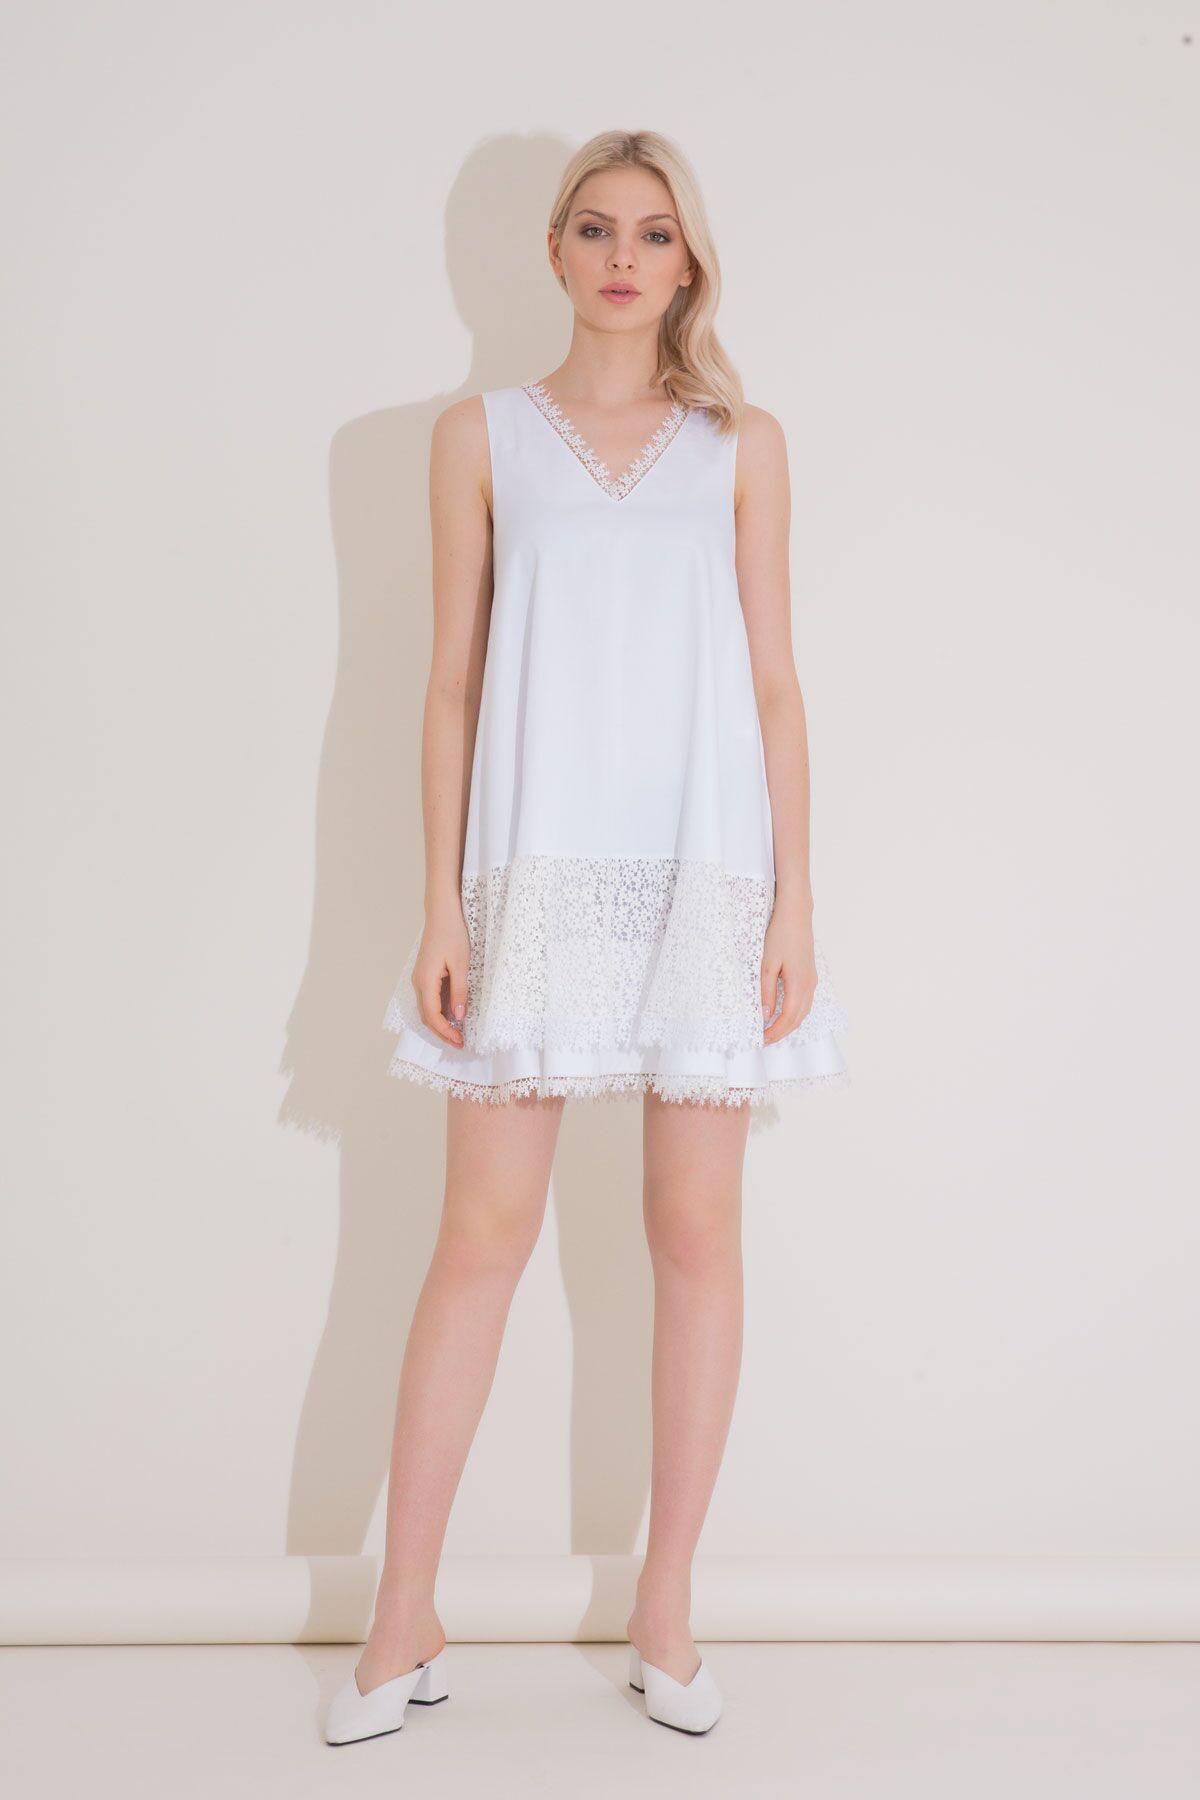 Dantel Garnili V Yaka Beyaz Kısa Elbise